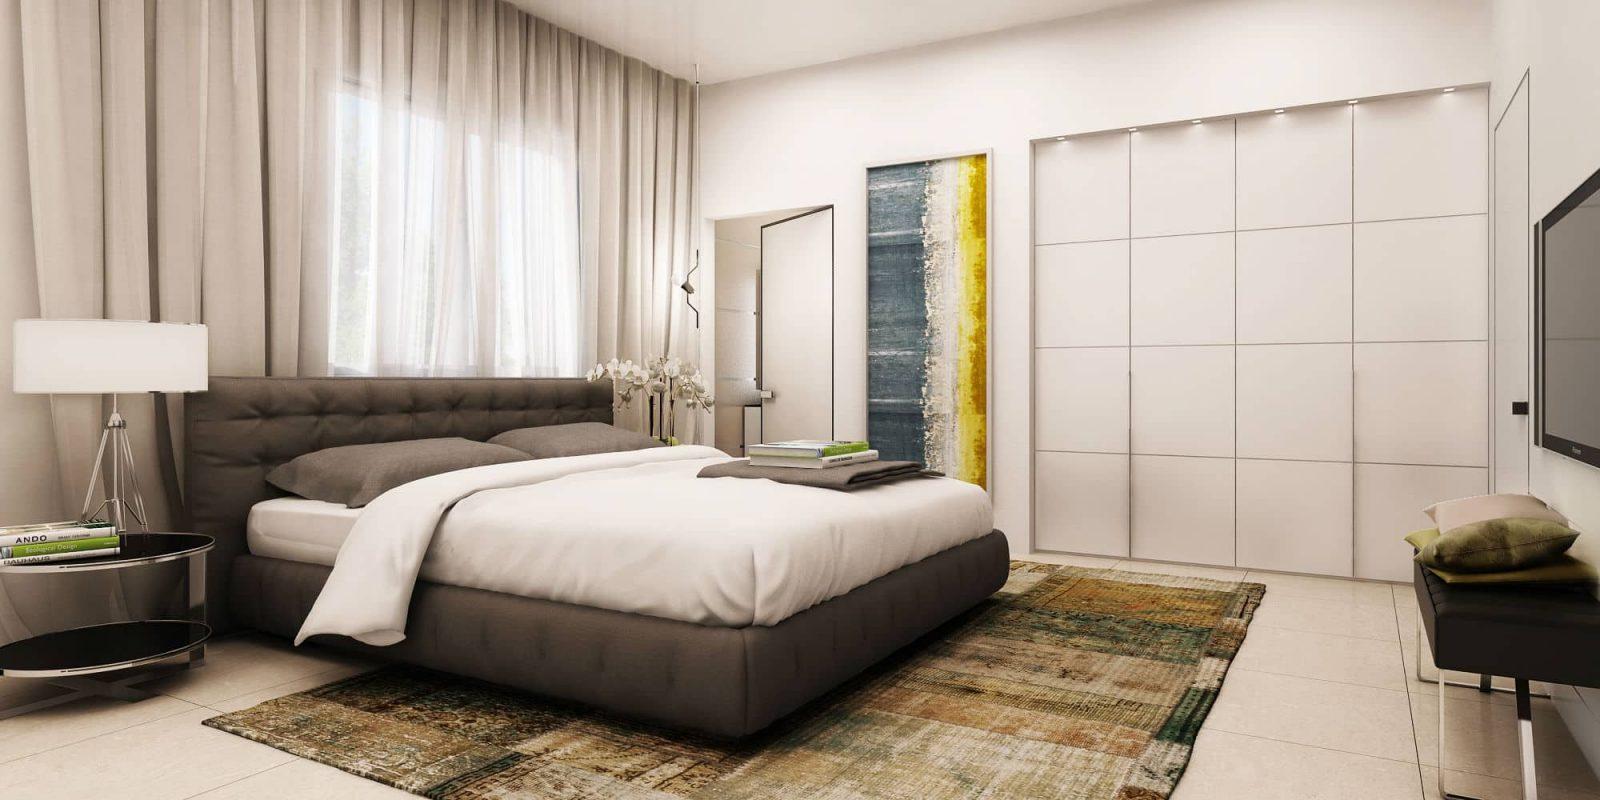 Web3D - תמונות תלת מימד - אילוסטרציה של חדר שינה